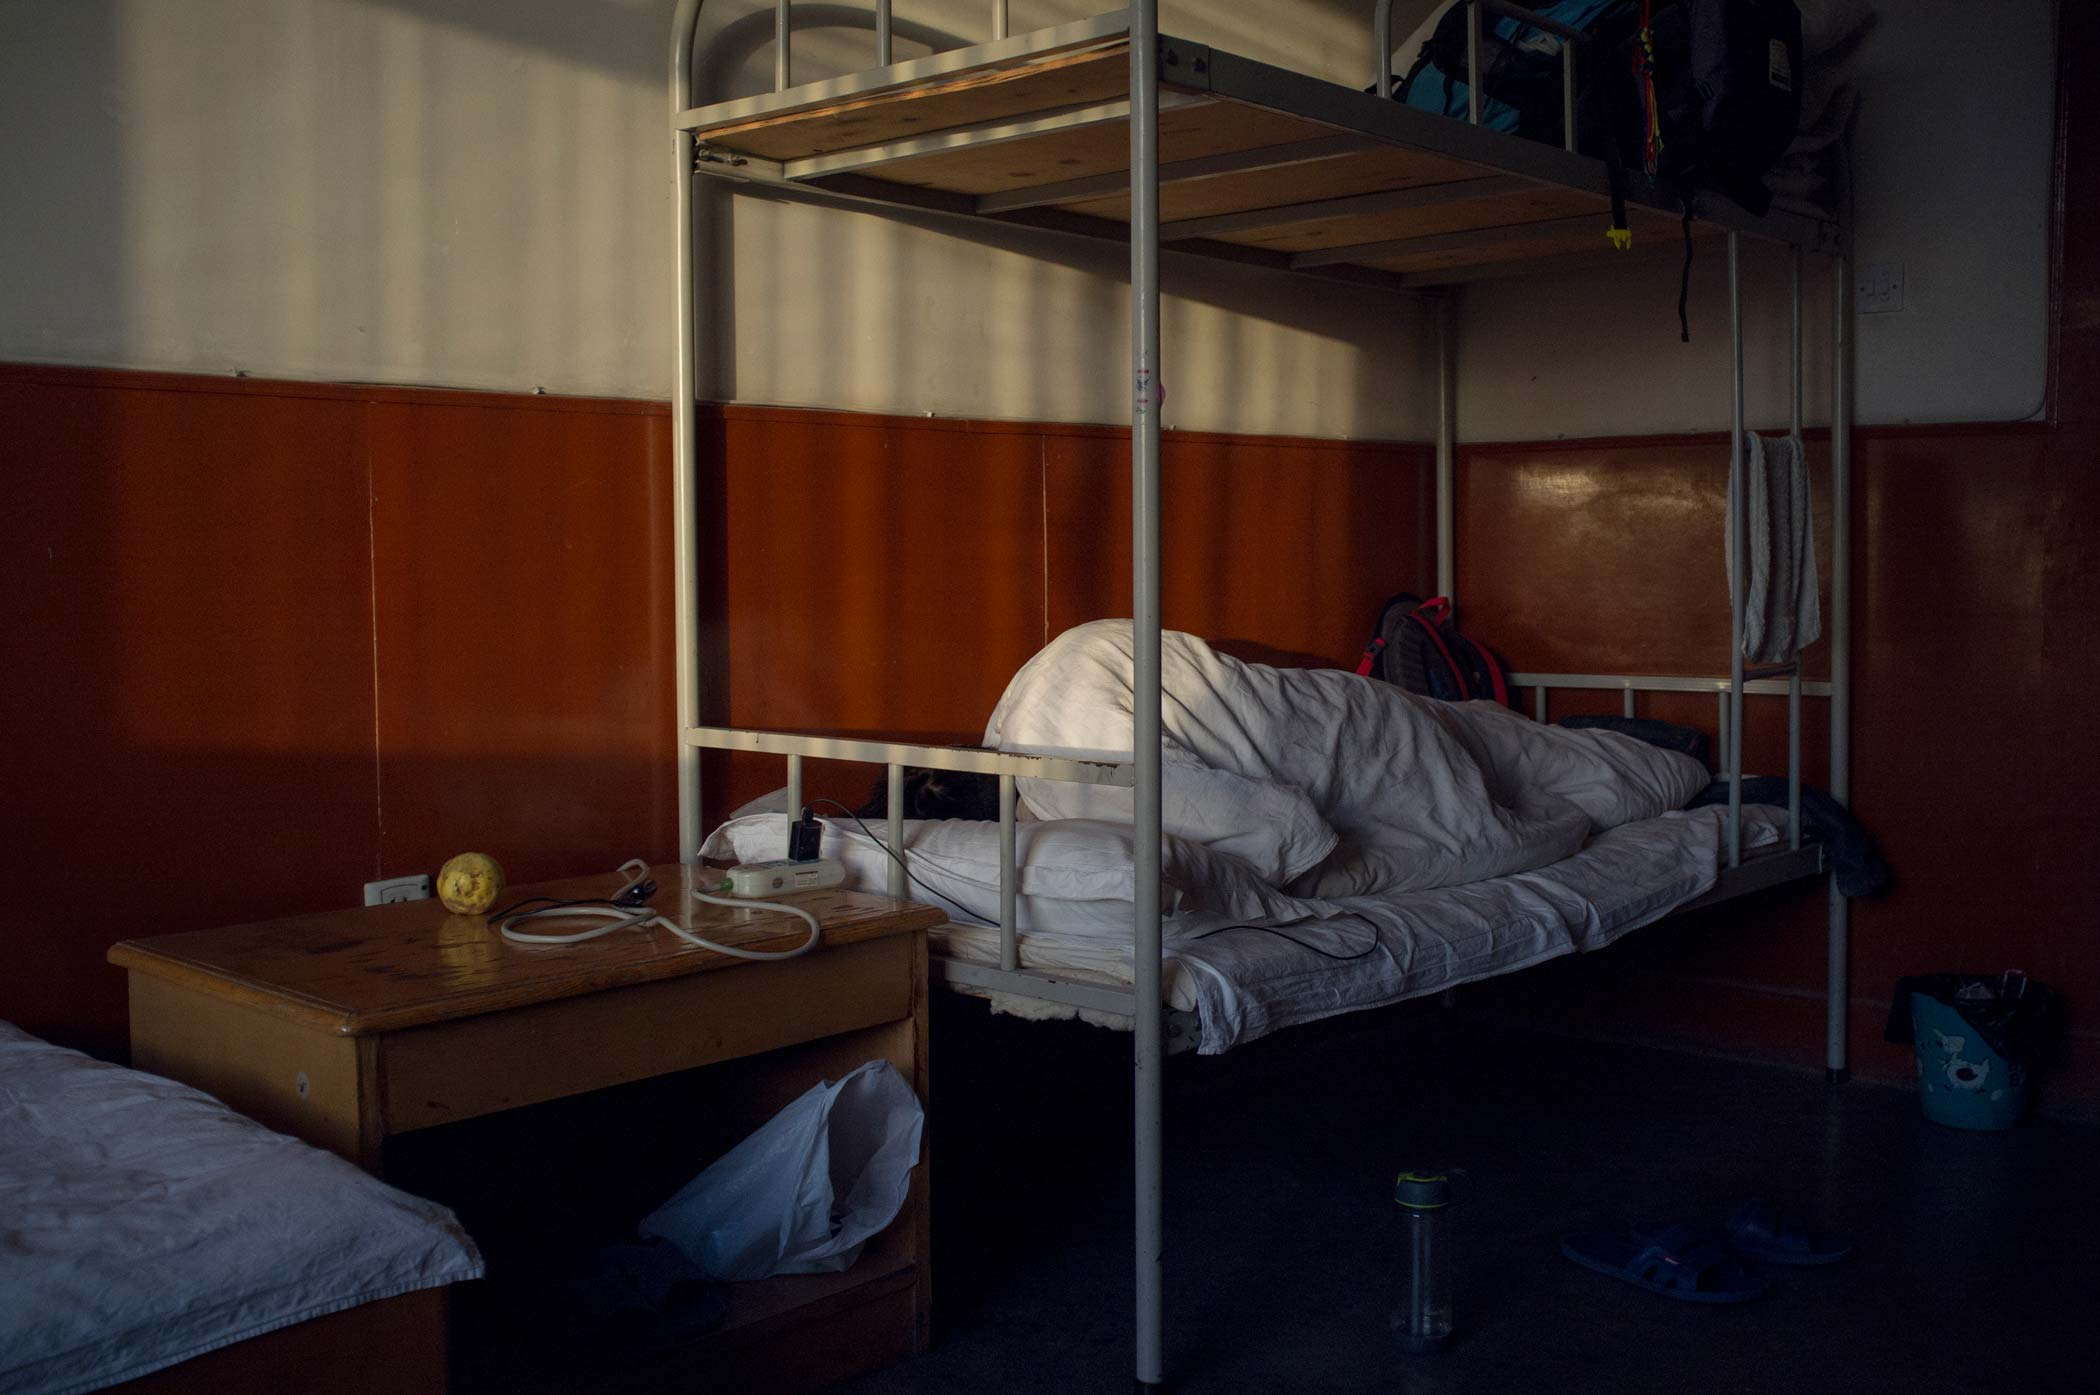 A man asleep in a dormitory bed in Xinjiang, China